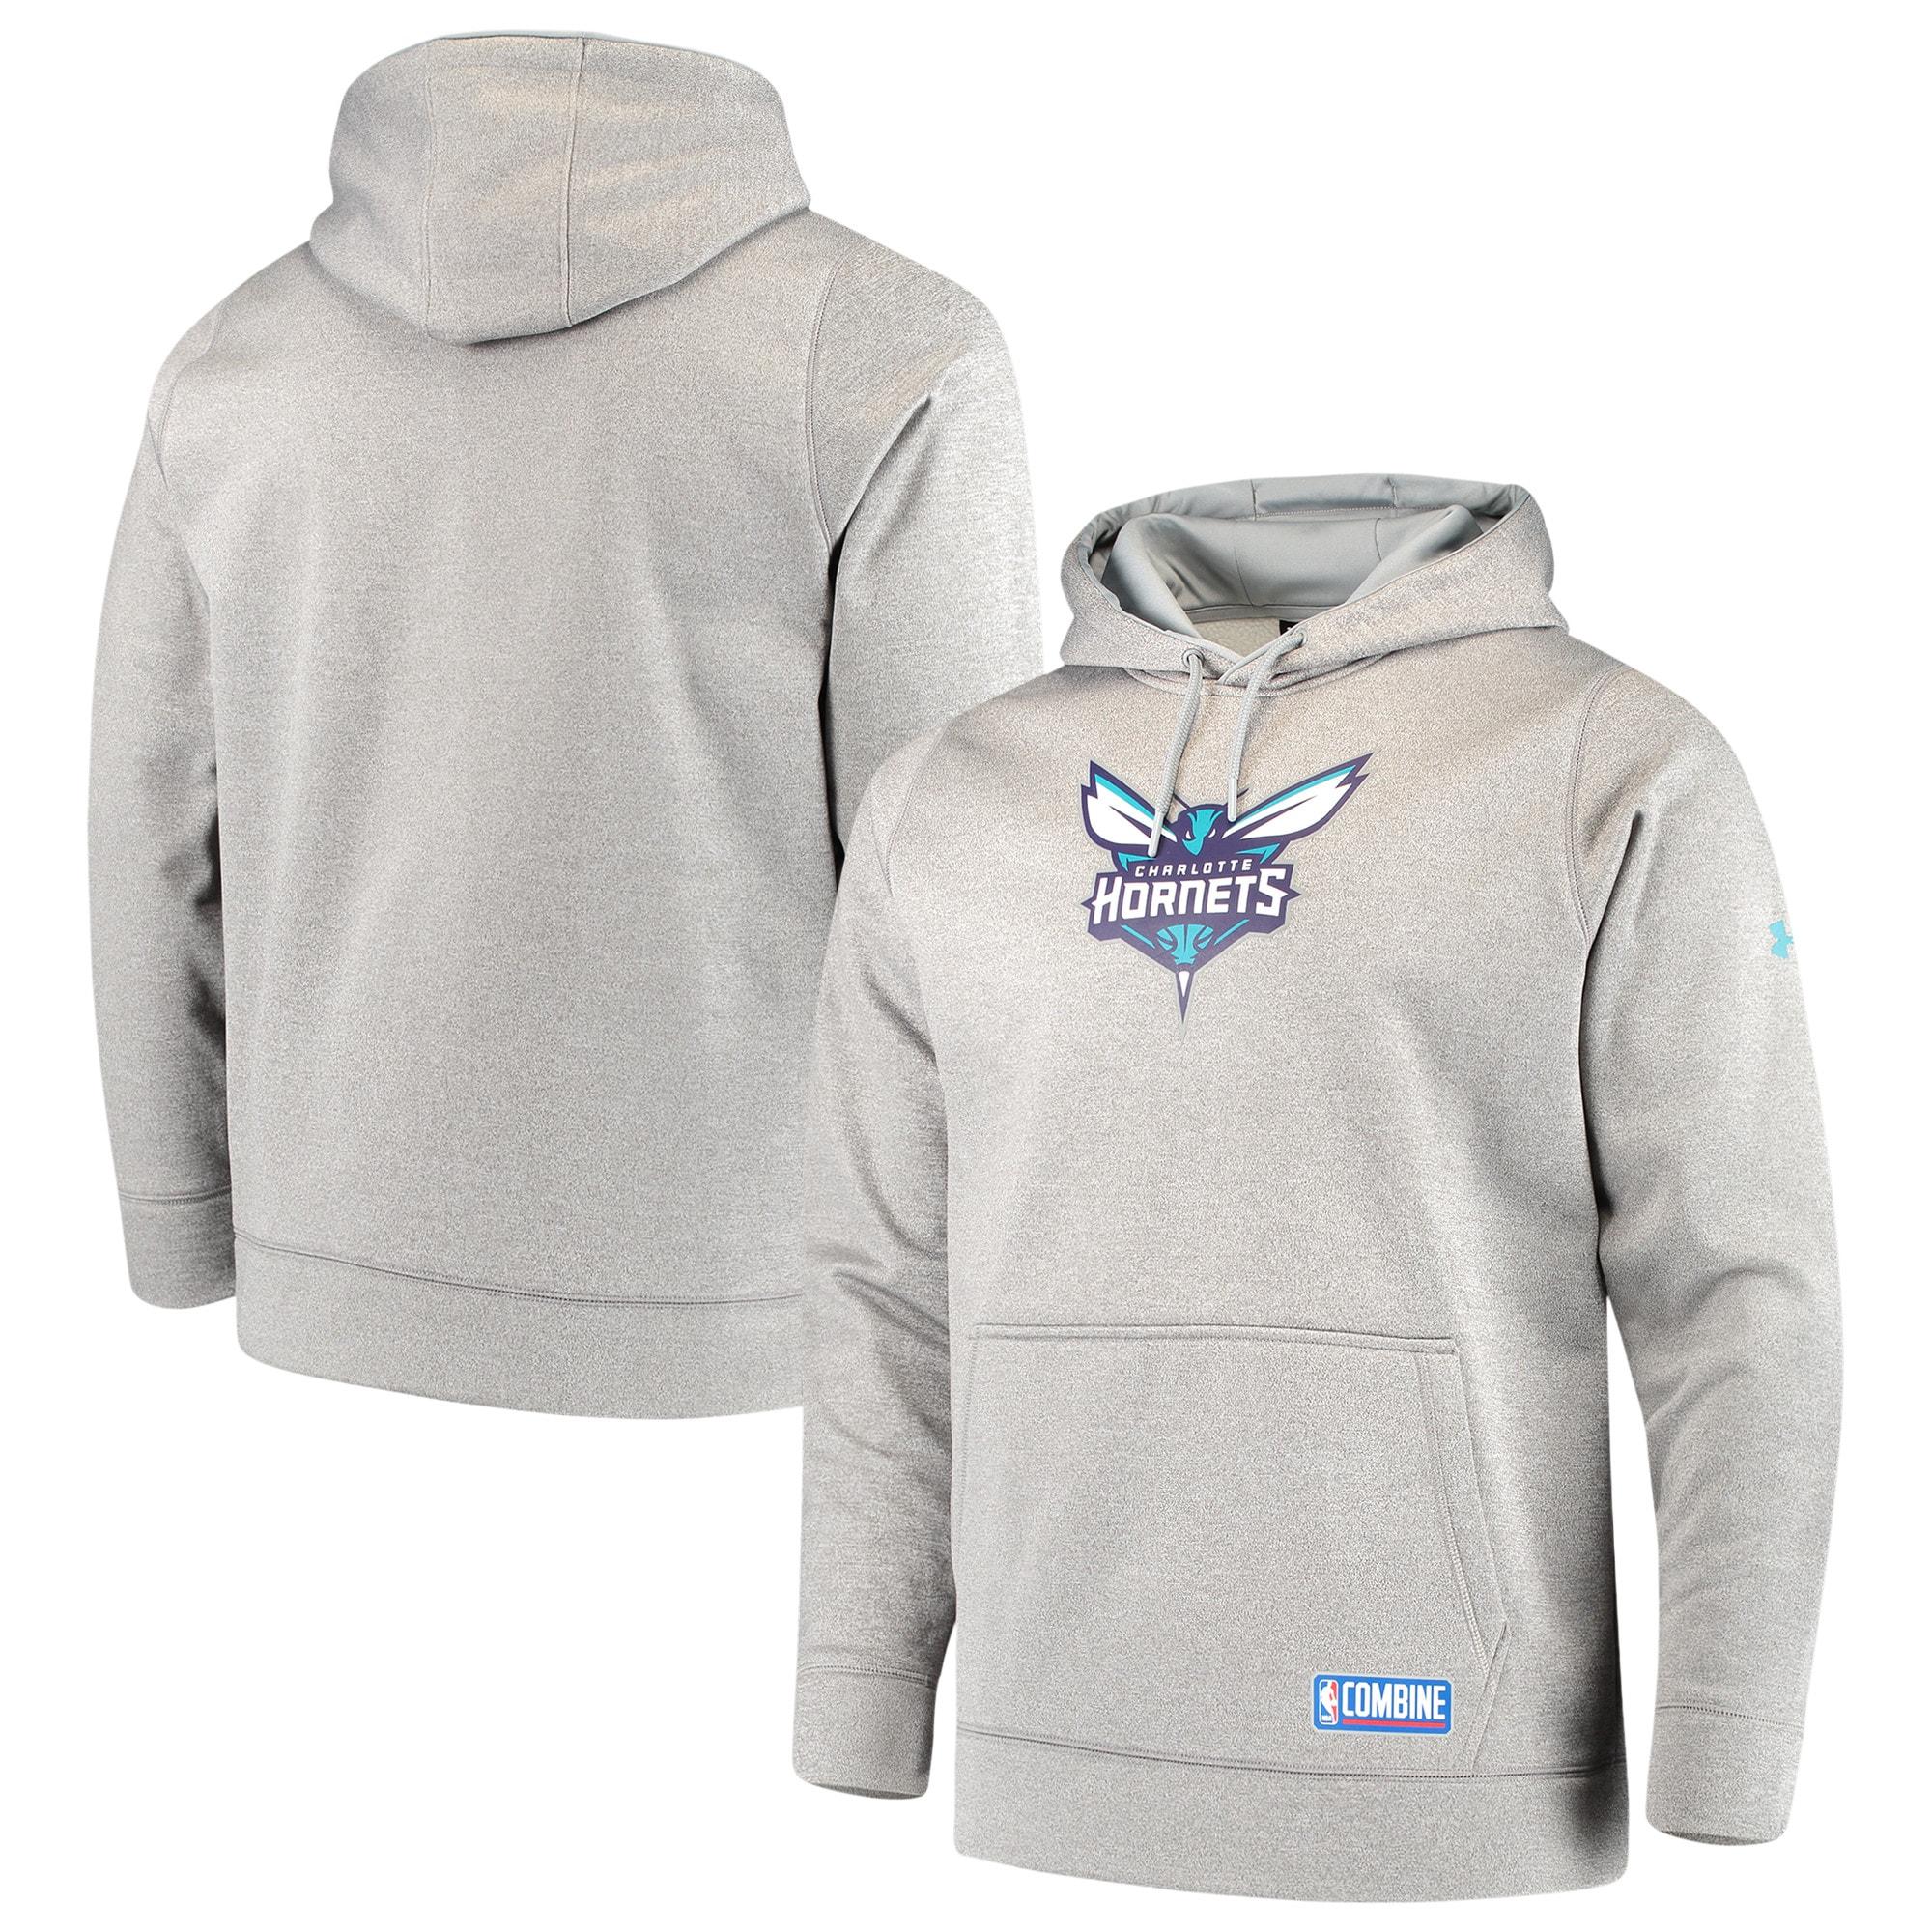 Charlotte Hornets Under Armour Team Logo Performance Fleece Pullover Hoodie - Gray